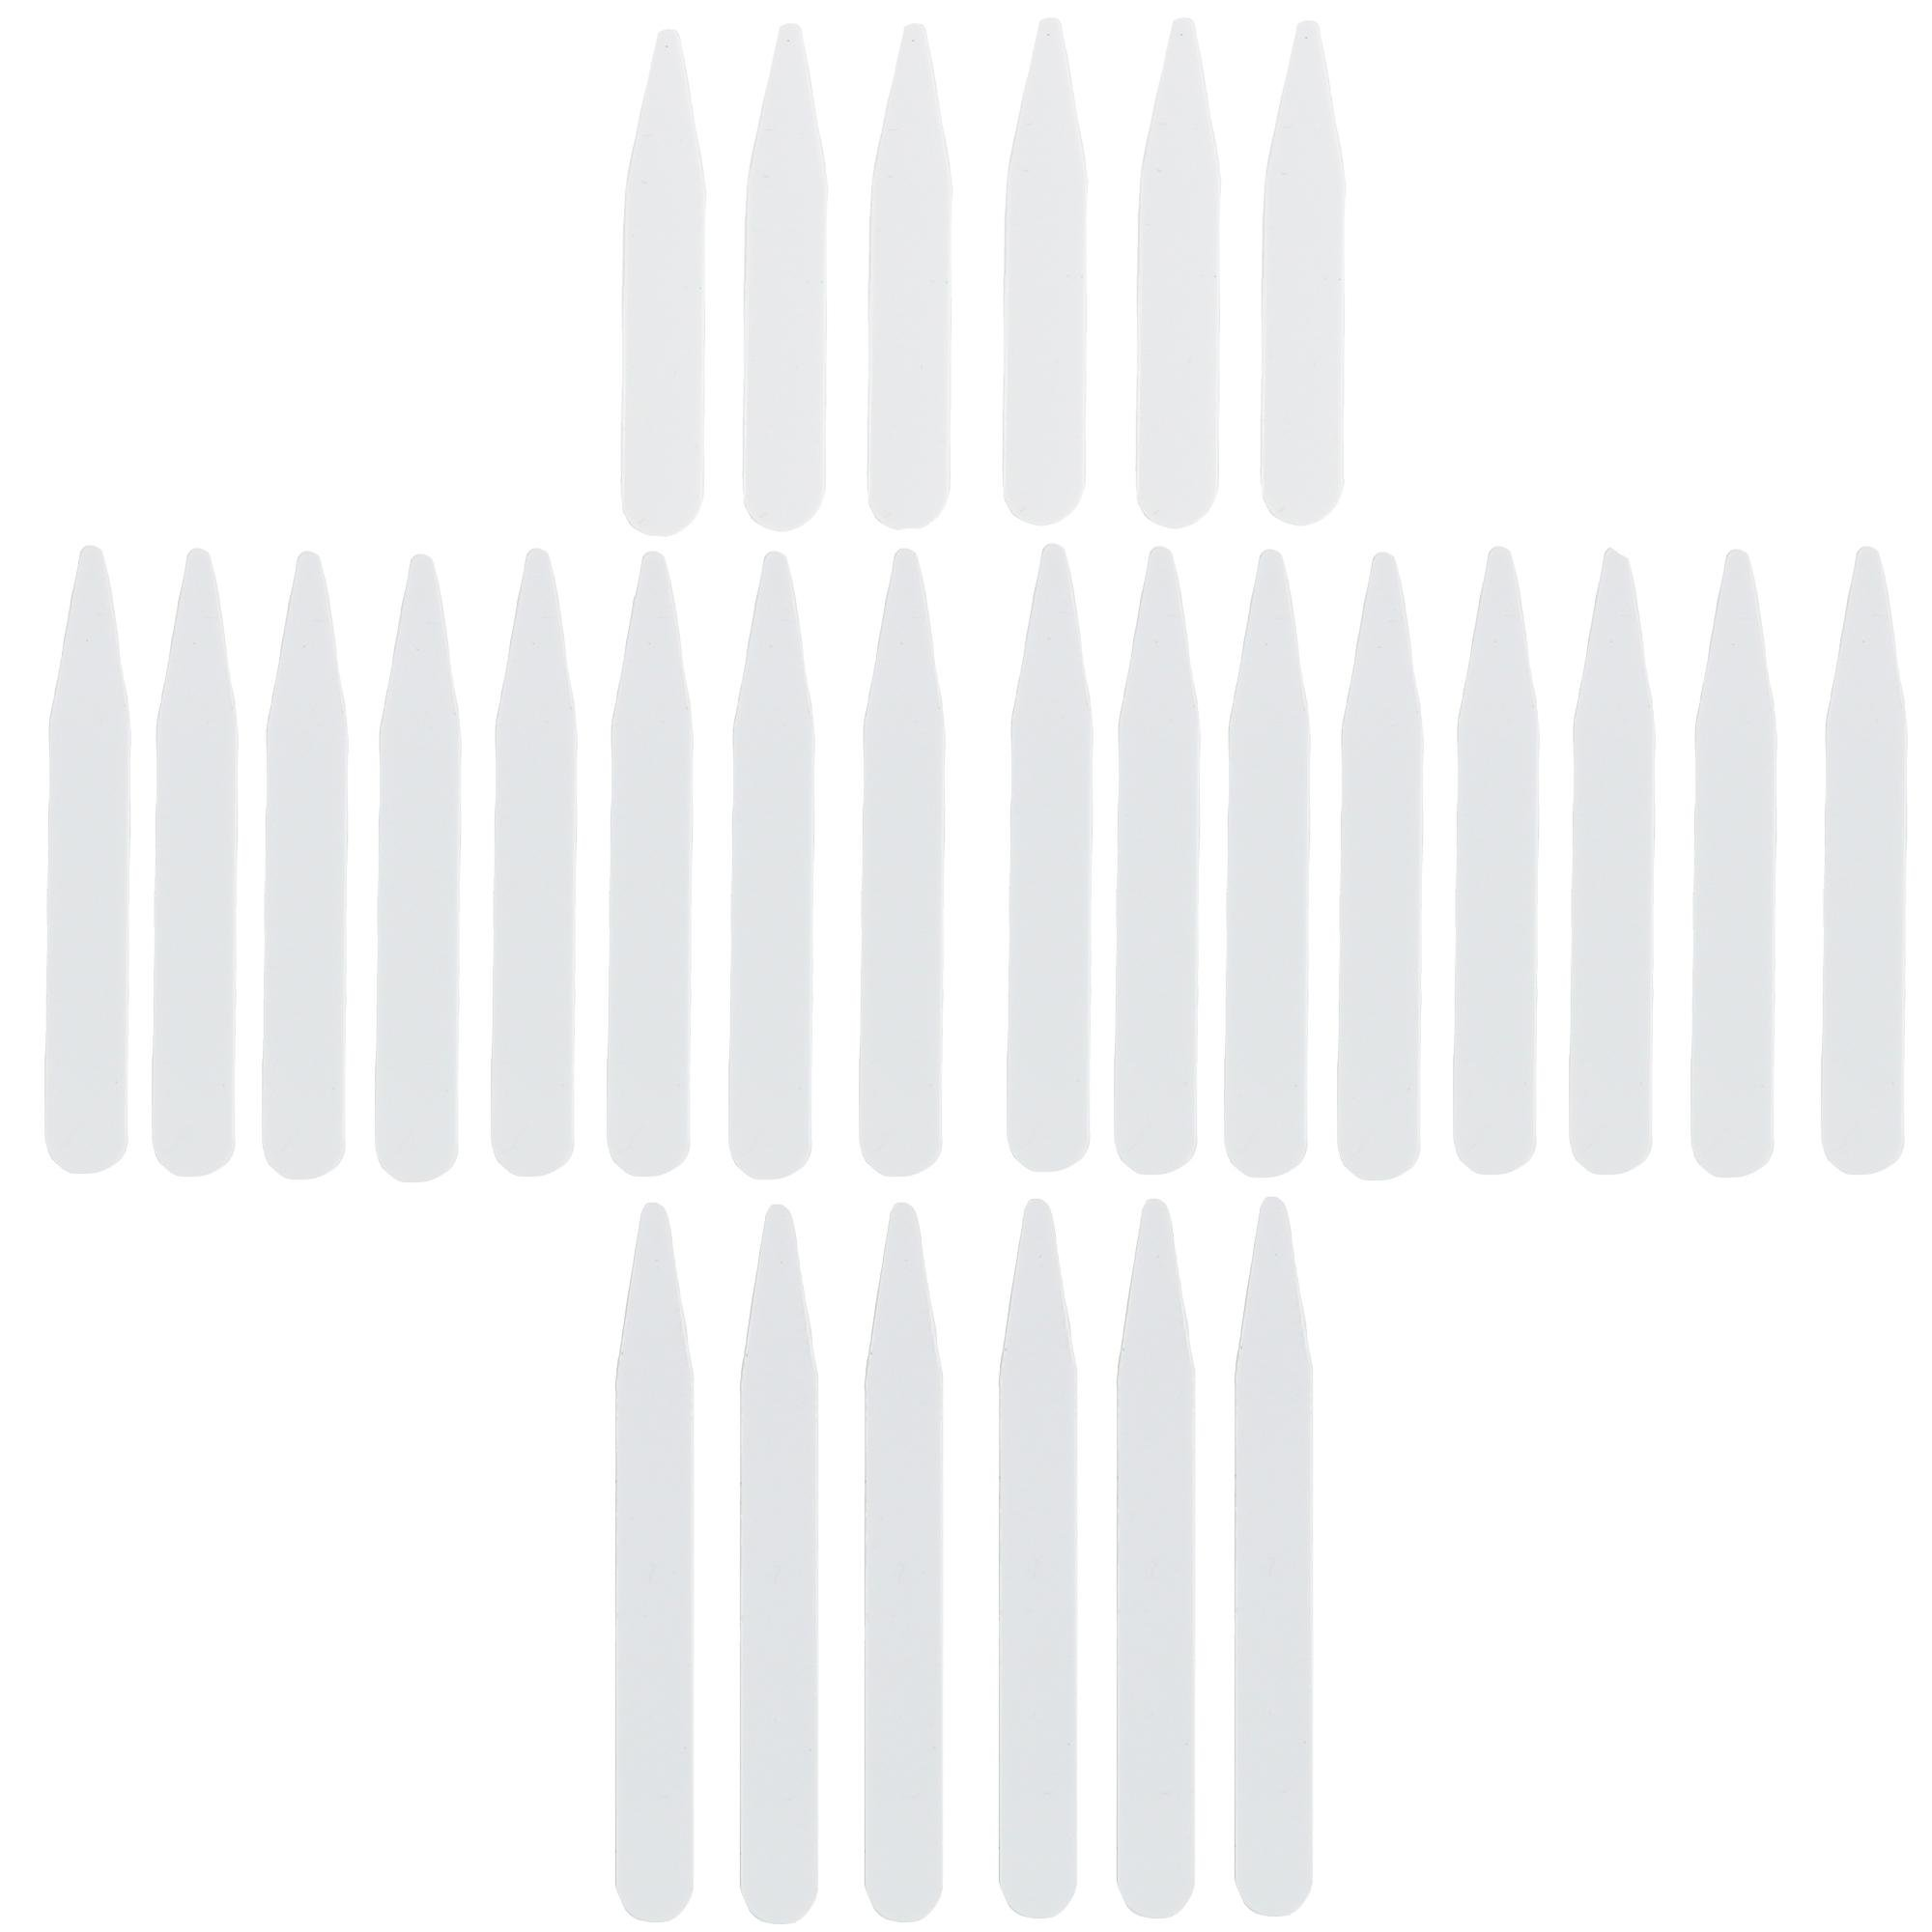 CrookhornDavis Men's Plastic Collar Stays in 3 Lengths (Pack of 14 Sets), White